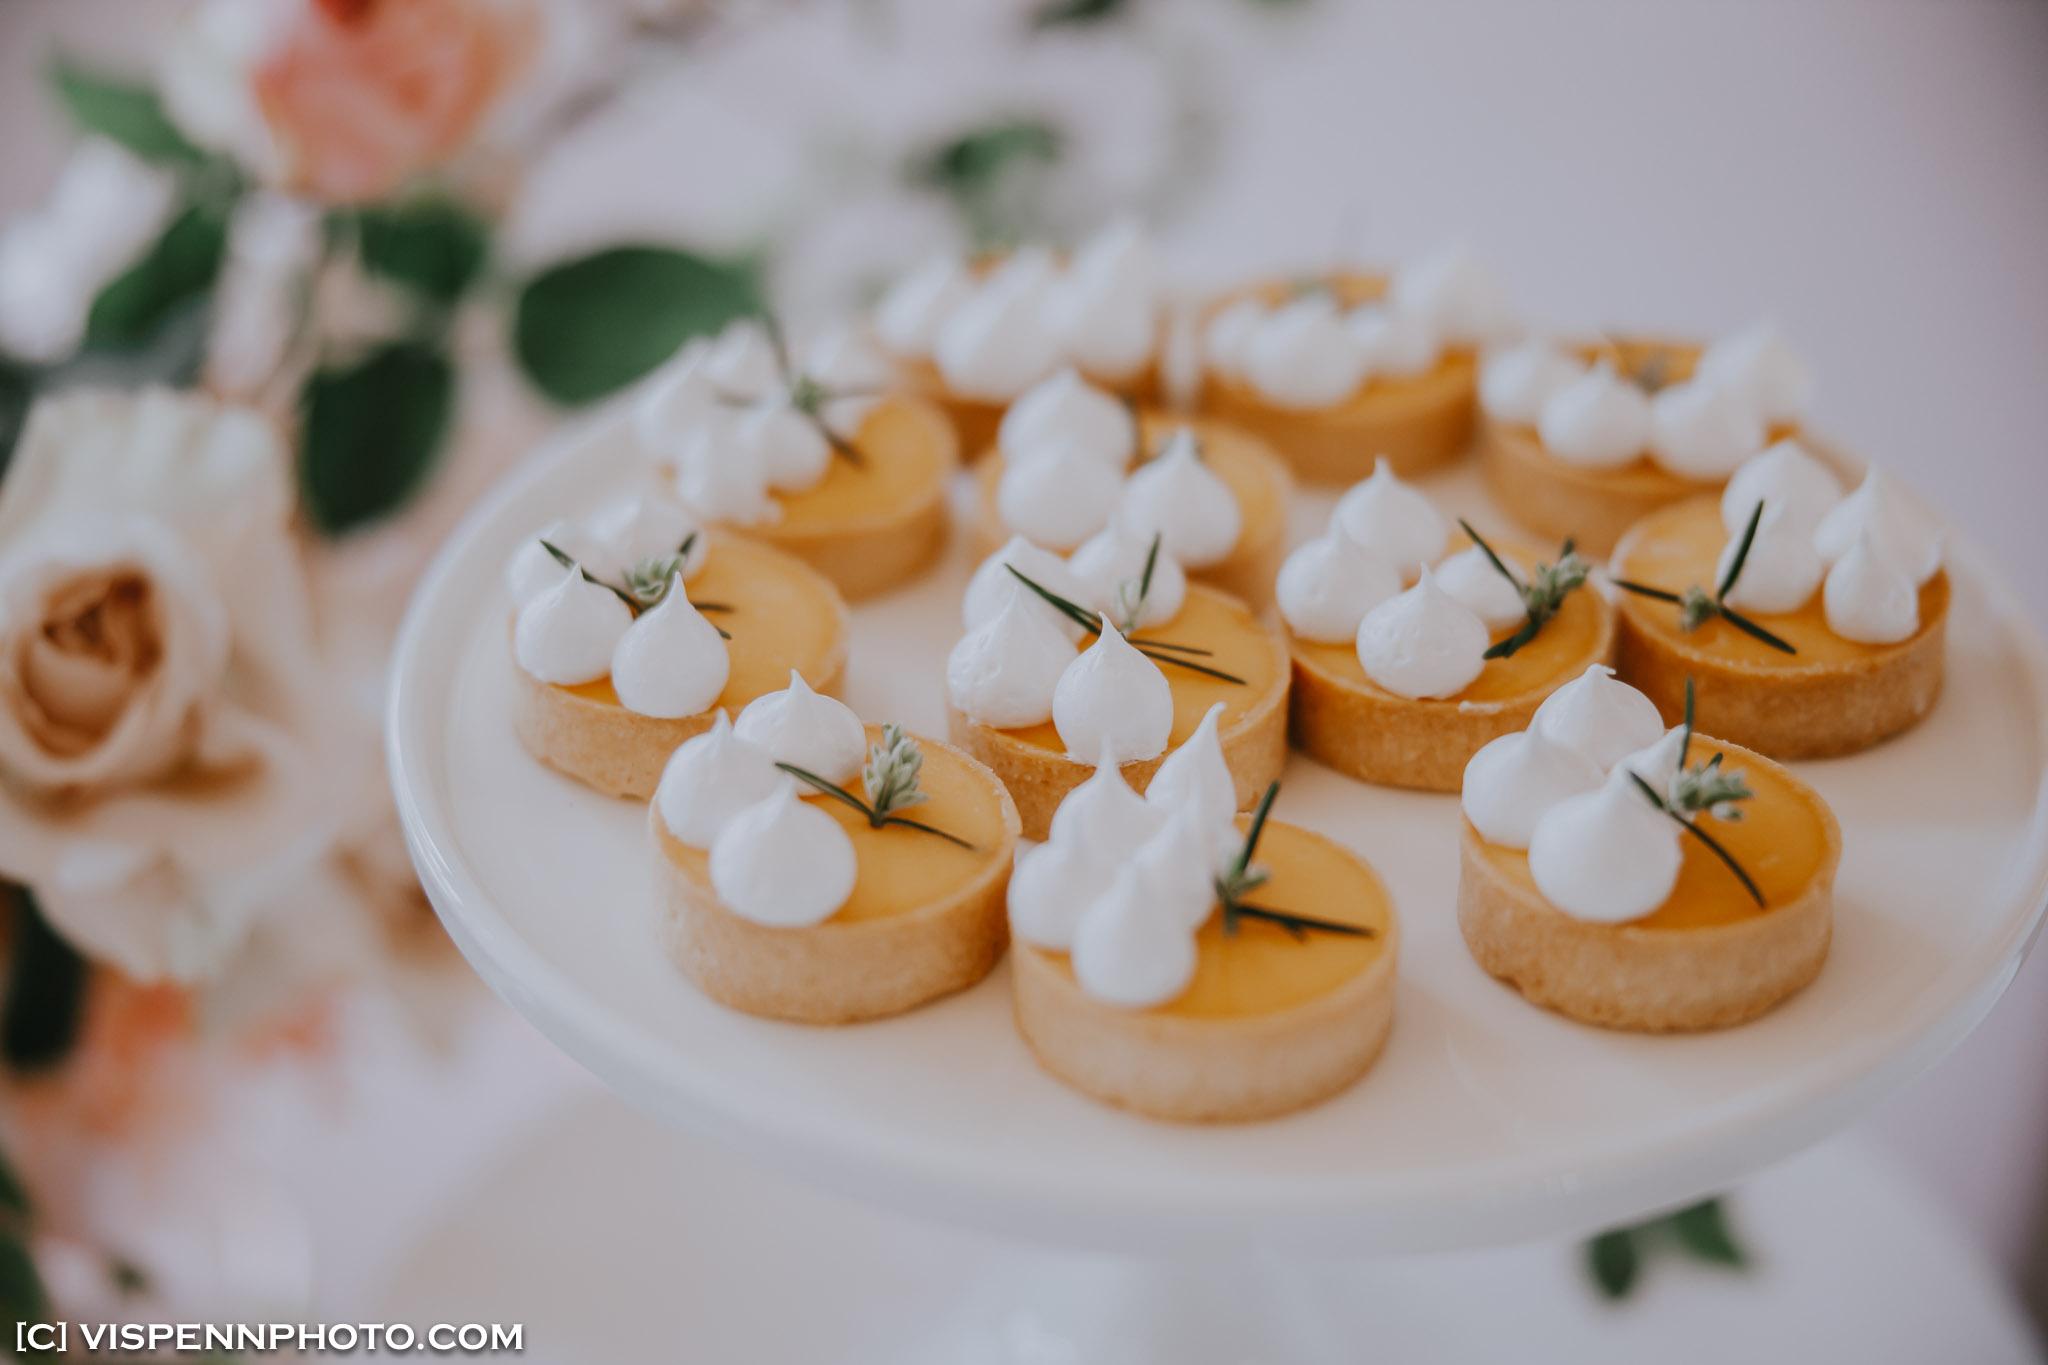 WEDDING DAY Photography Melbourne ElitaPB 06858 1P EOSR ZHPENN